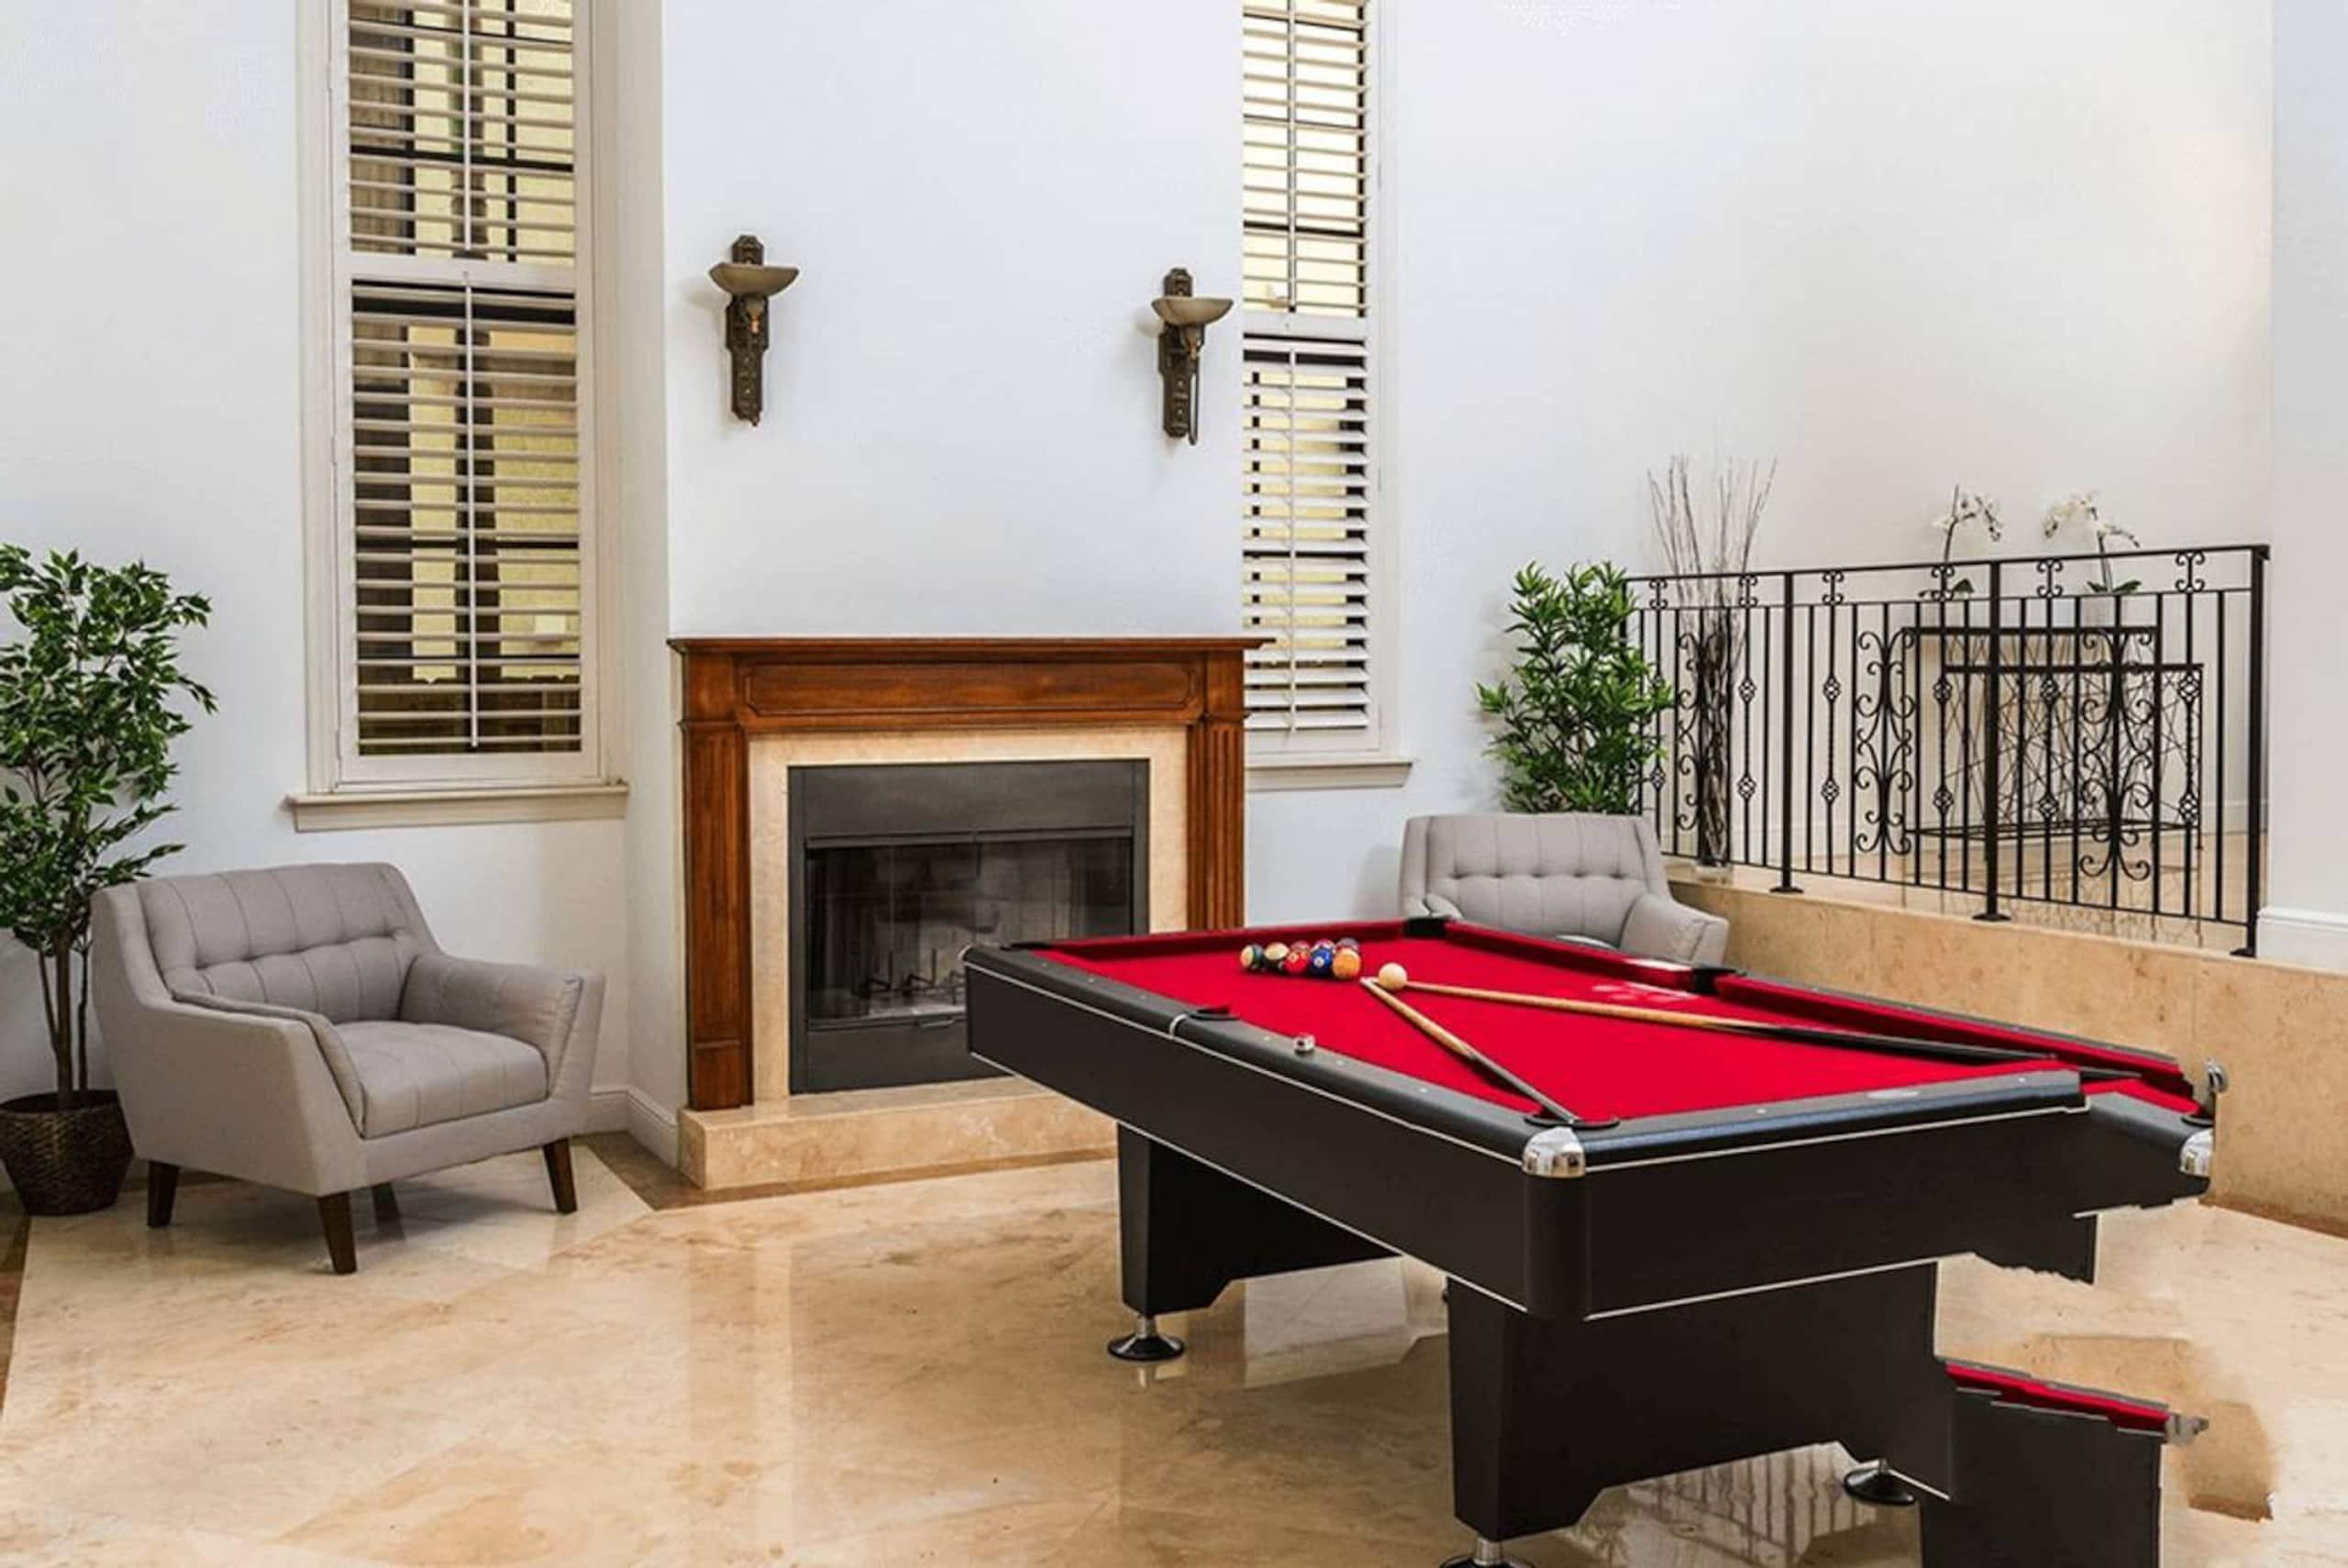 Apartment Villa Lawrence - Luxury Villa photo 22682520